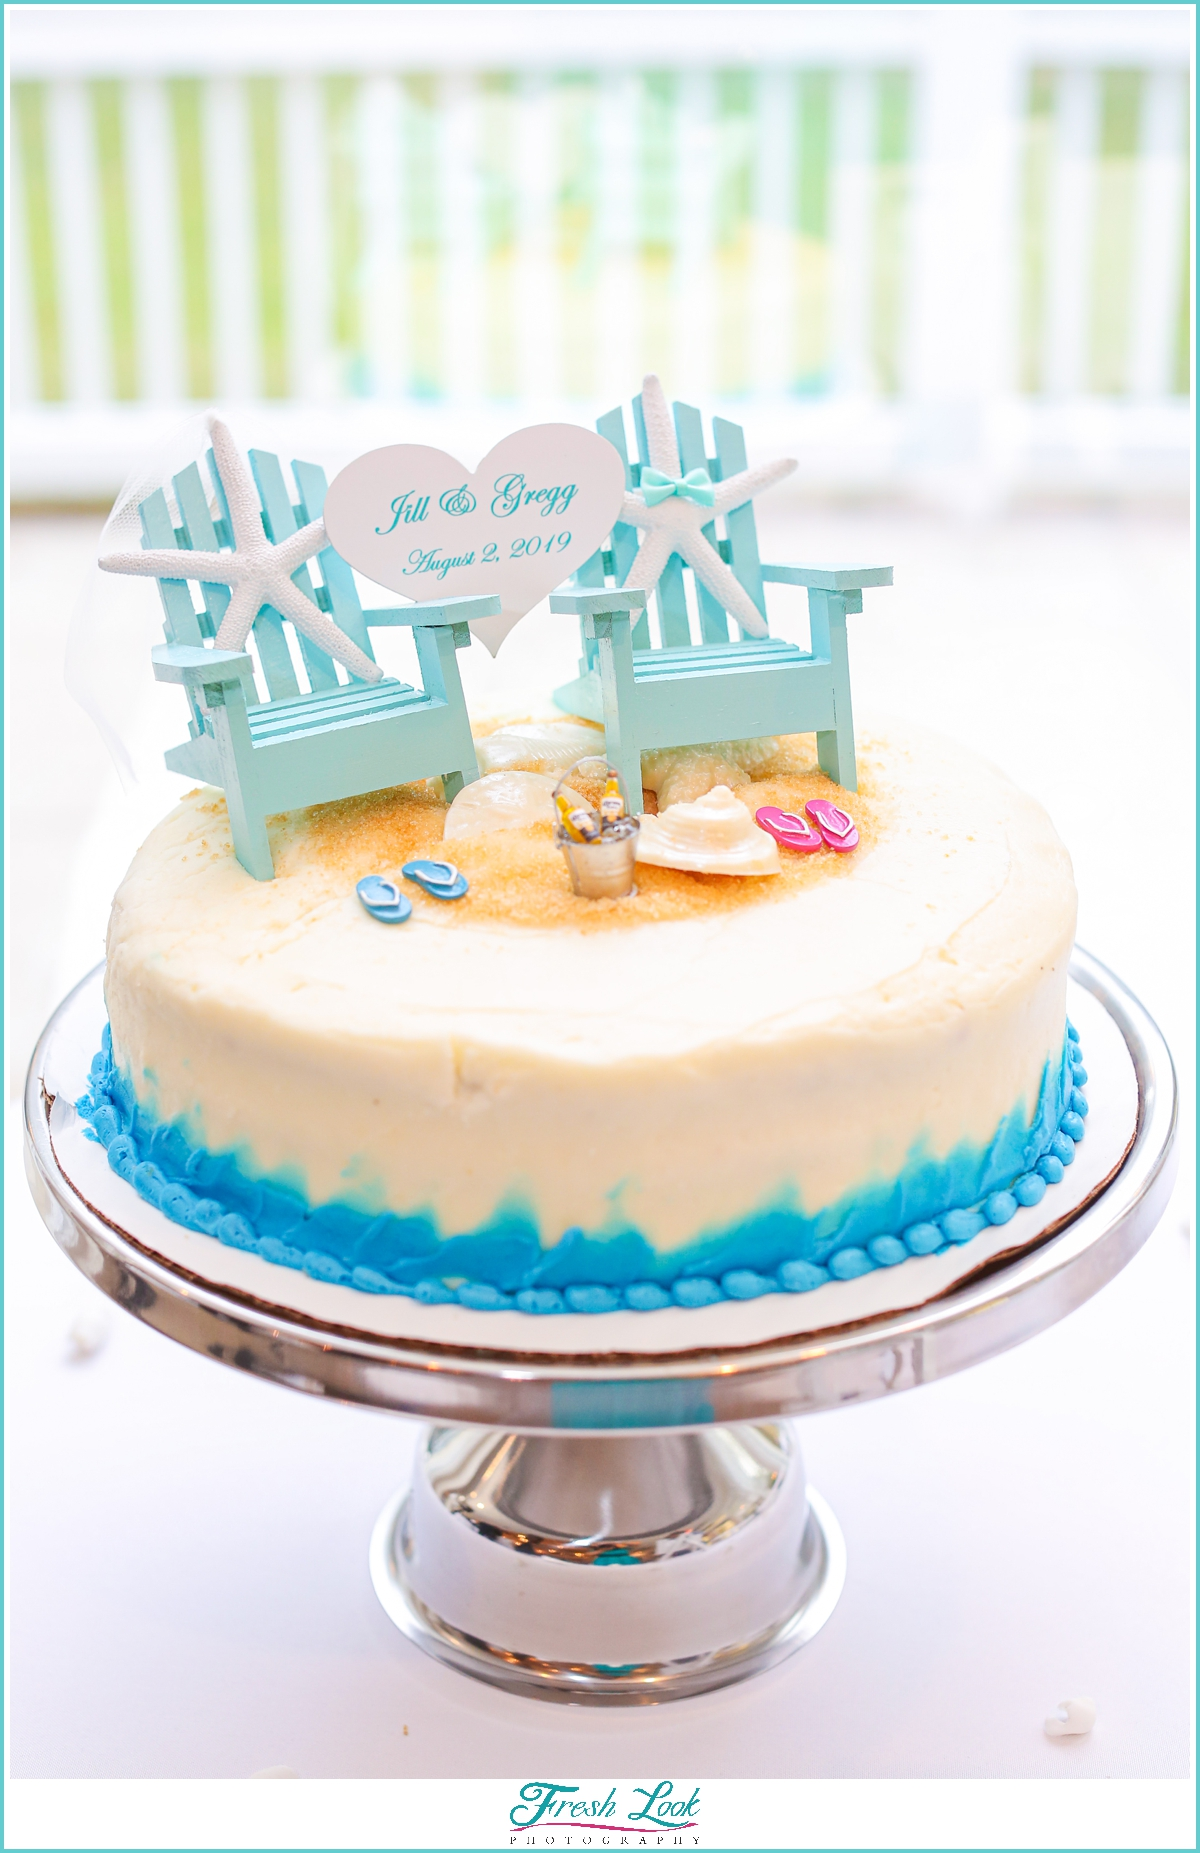 life's a beach wedding cake